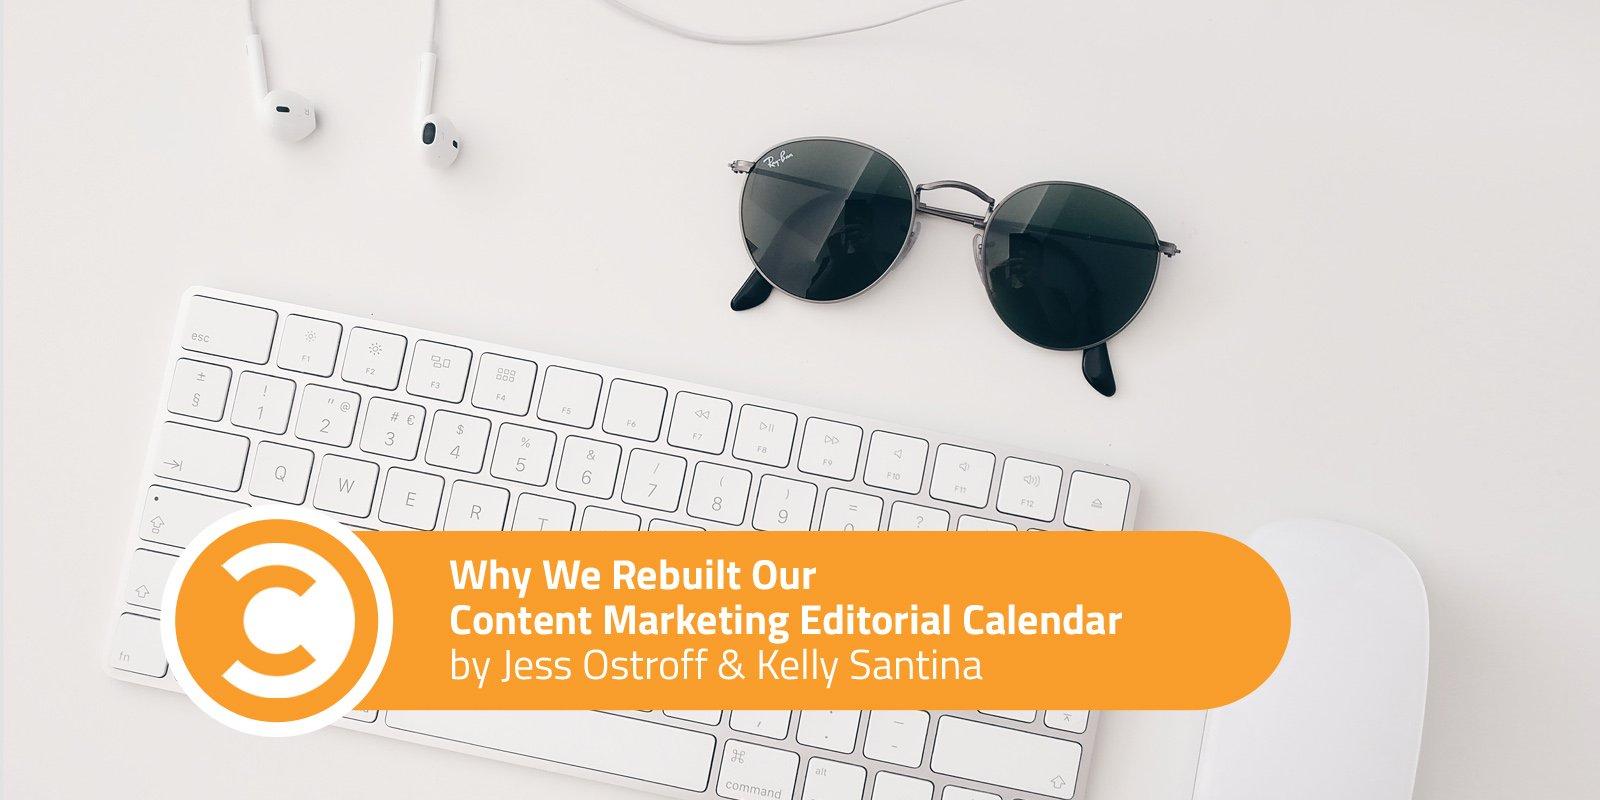 Why We Rebuilt Our Content Marketing Editorial Calendar